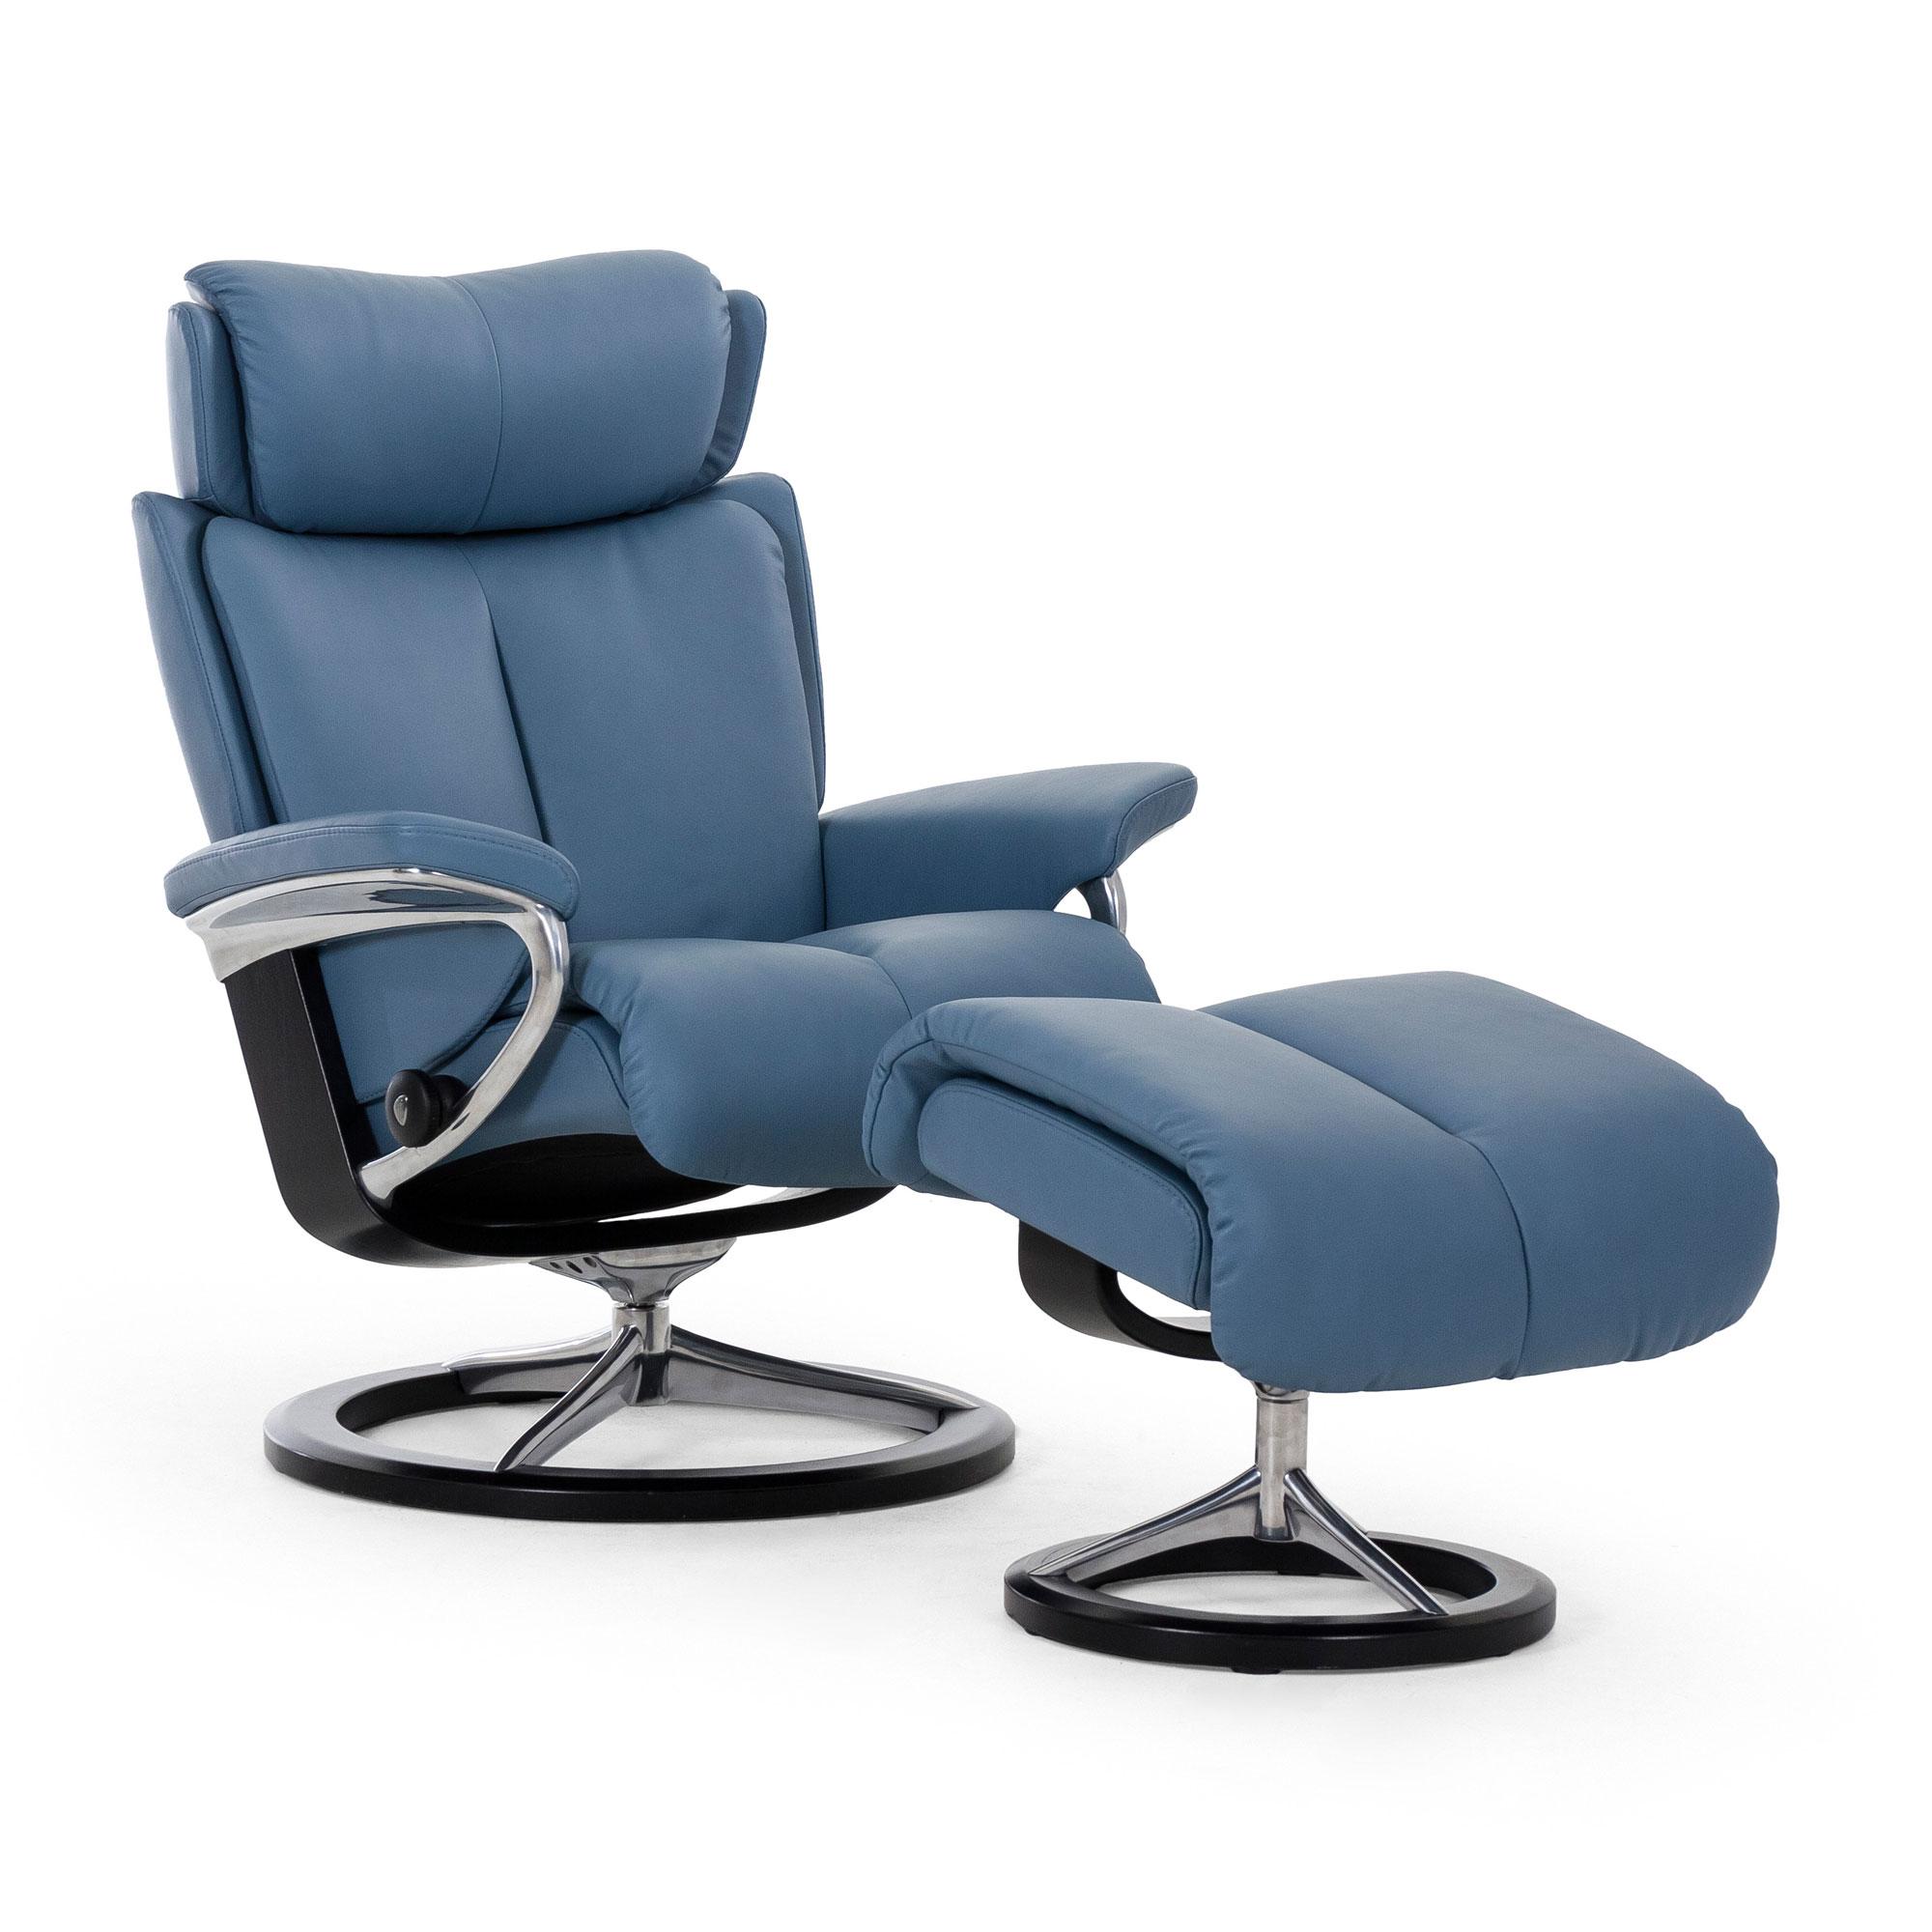 stressless sessel fabulous ausgereifte funktionen sitzen. Black Bedroom Furniture Sets. Home Design Ideas